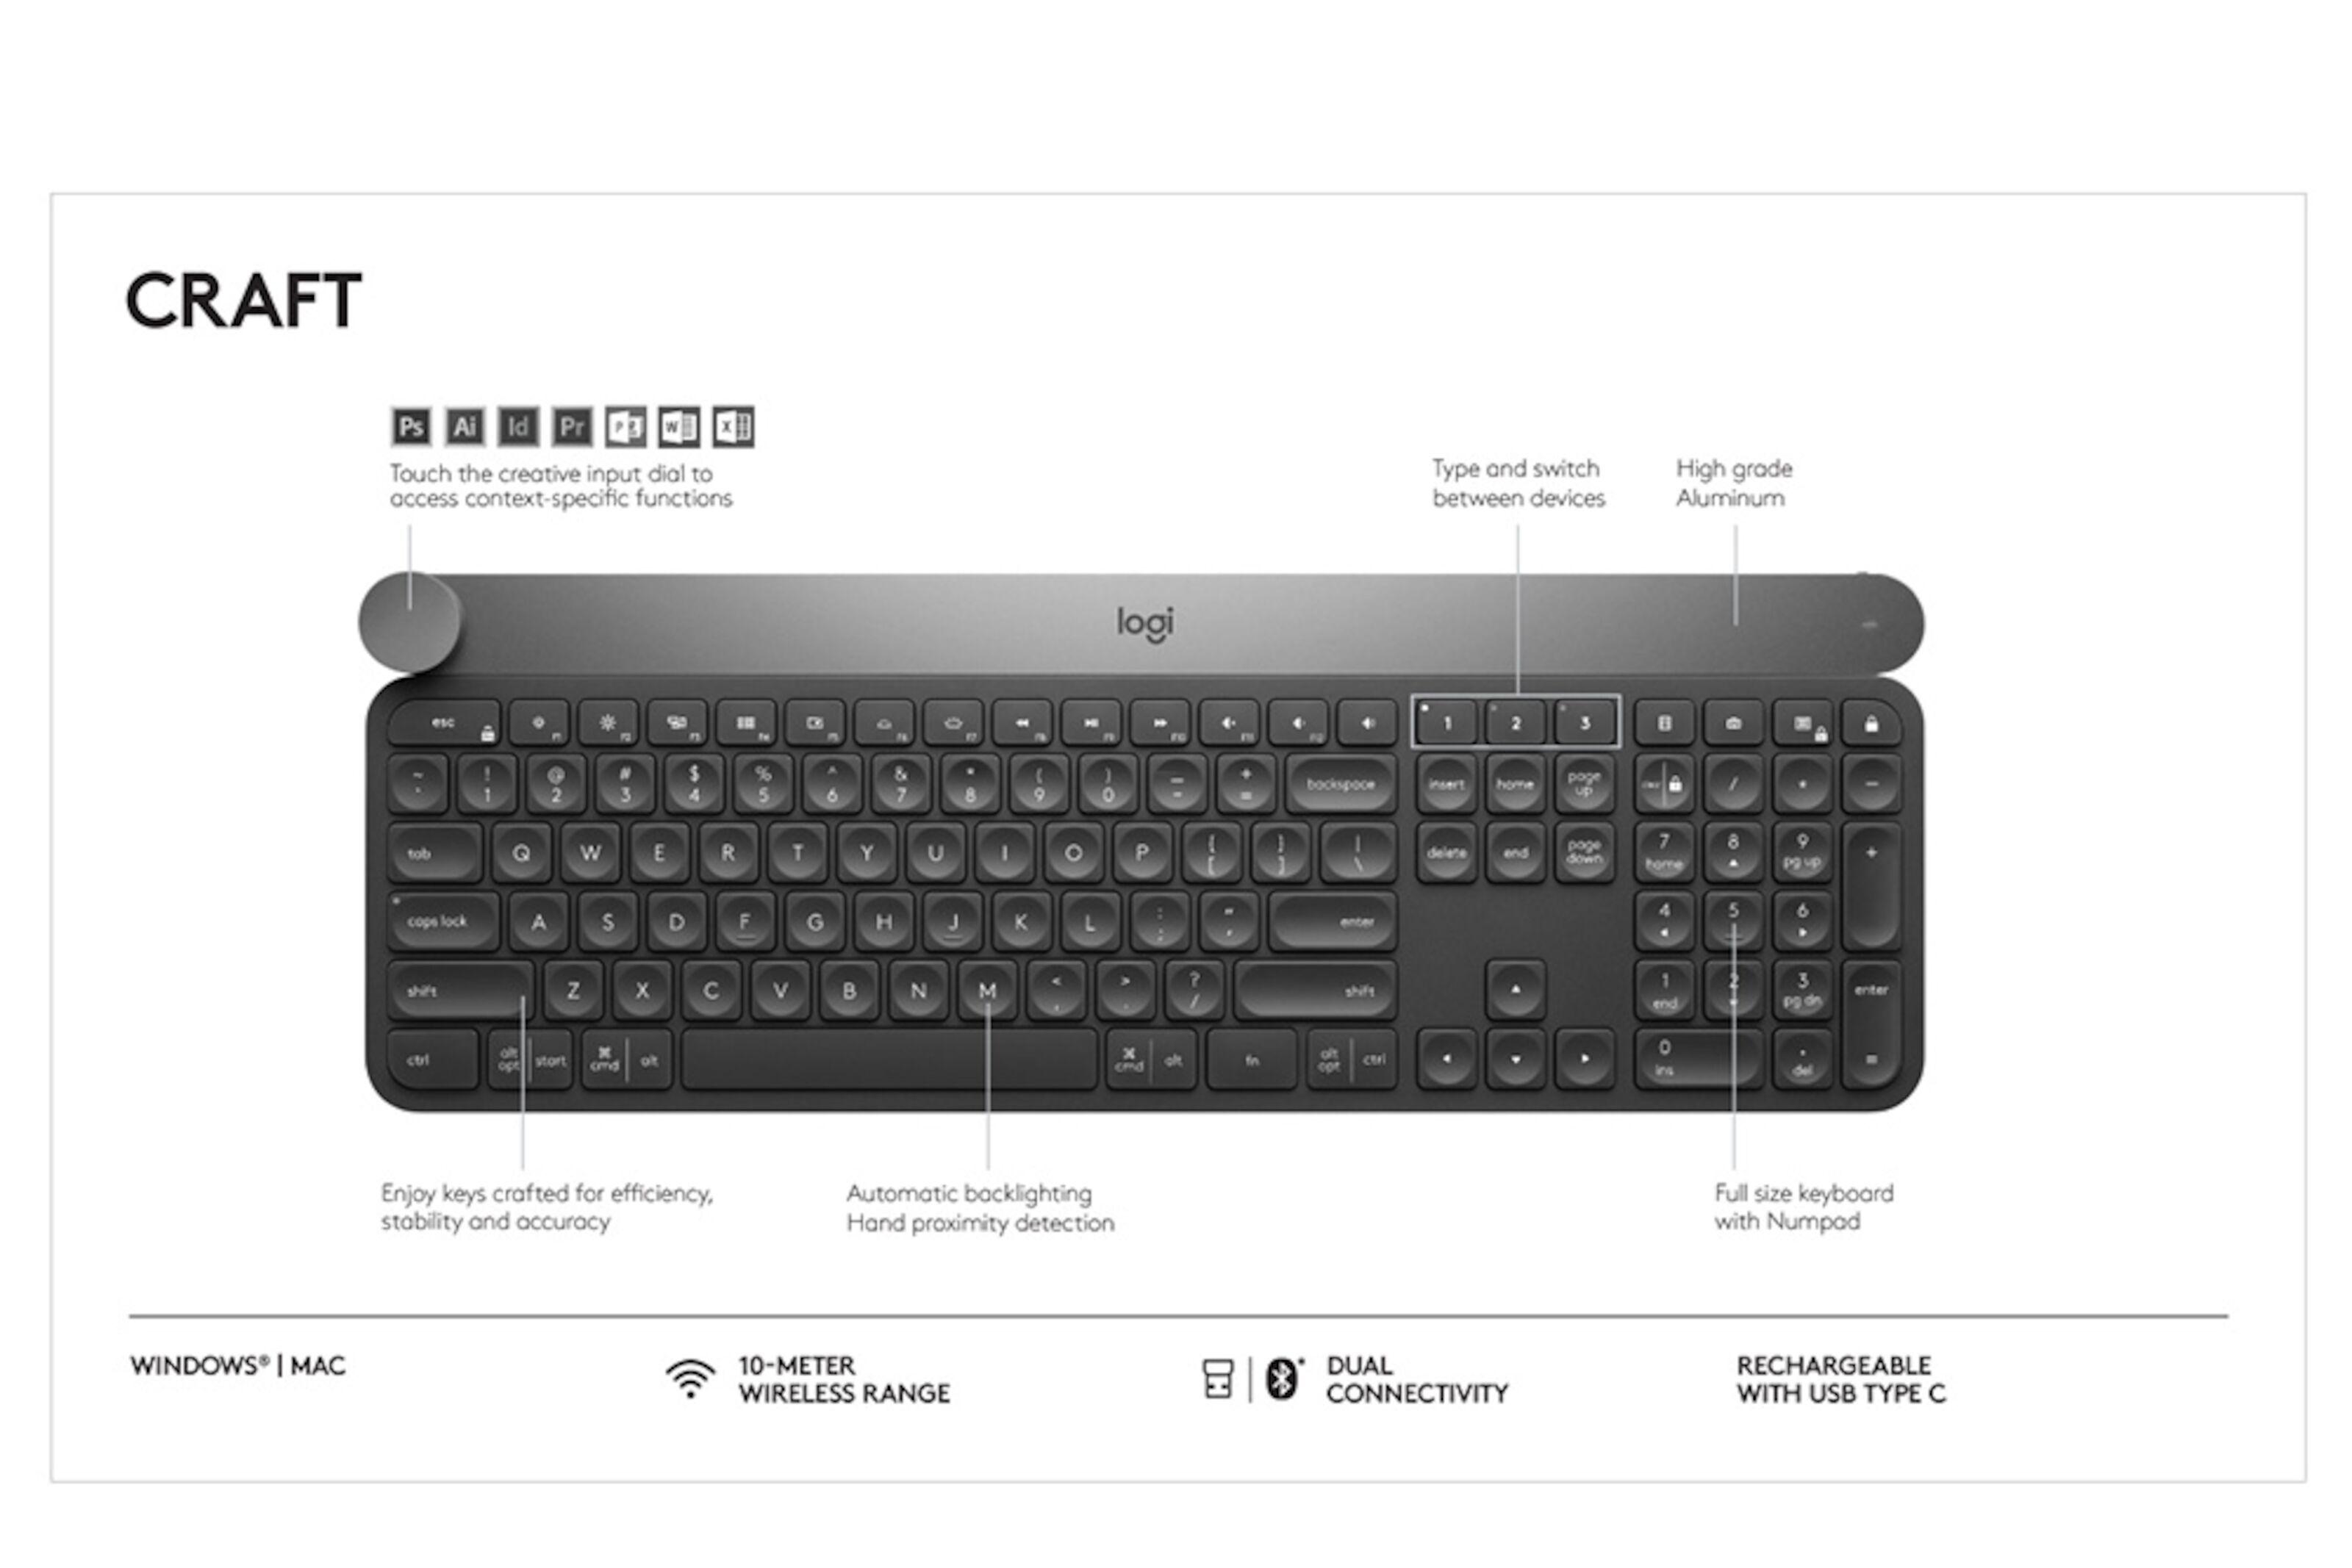 Logitech Craft Trådløst tastatur